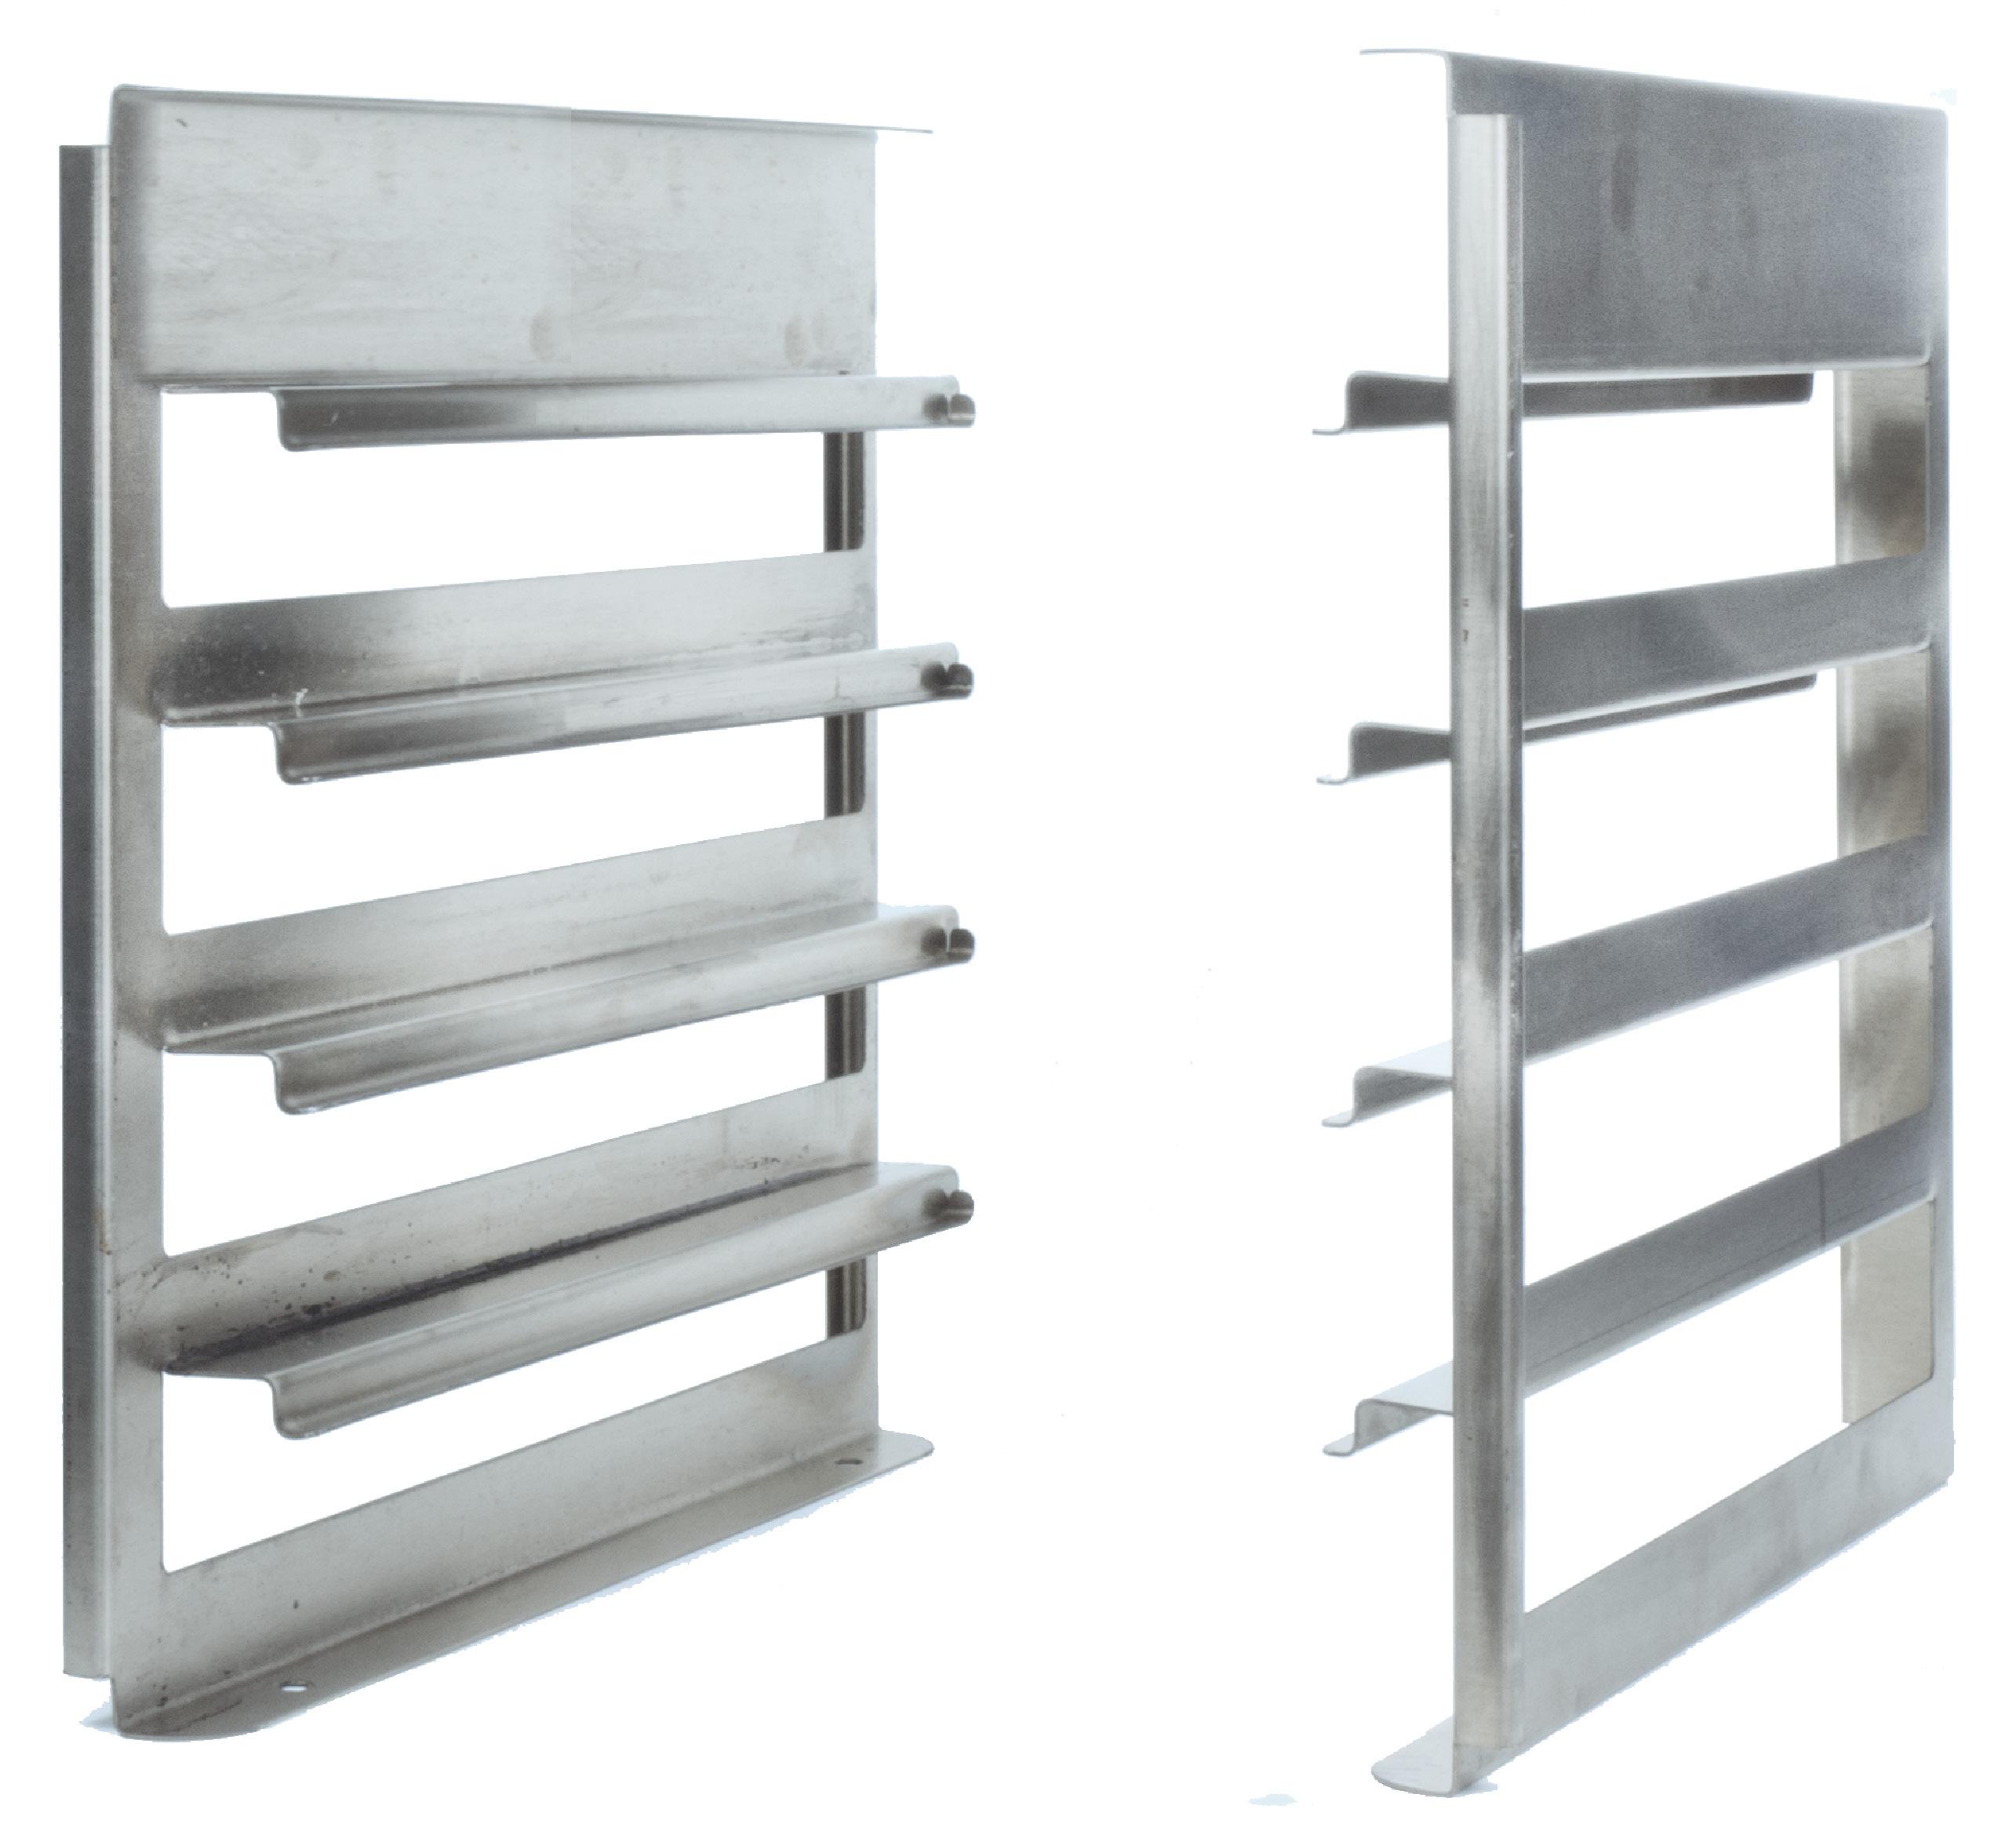 Eurast 41215202 Pastry rack (pair) 5 levels for 8 series ovens